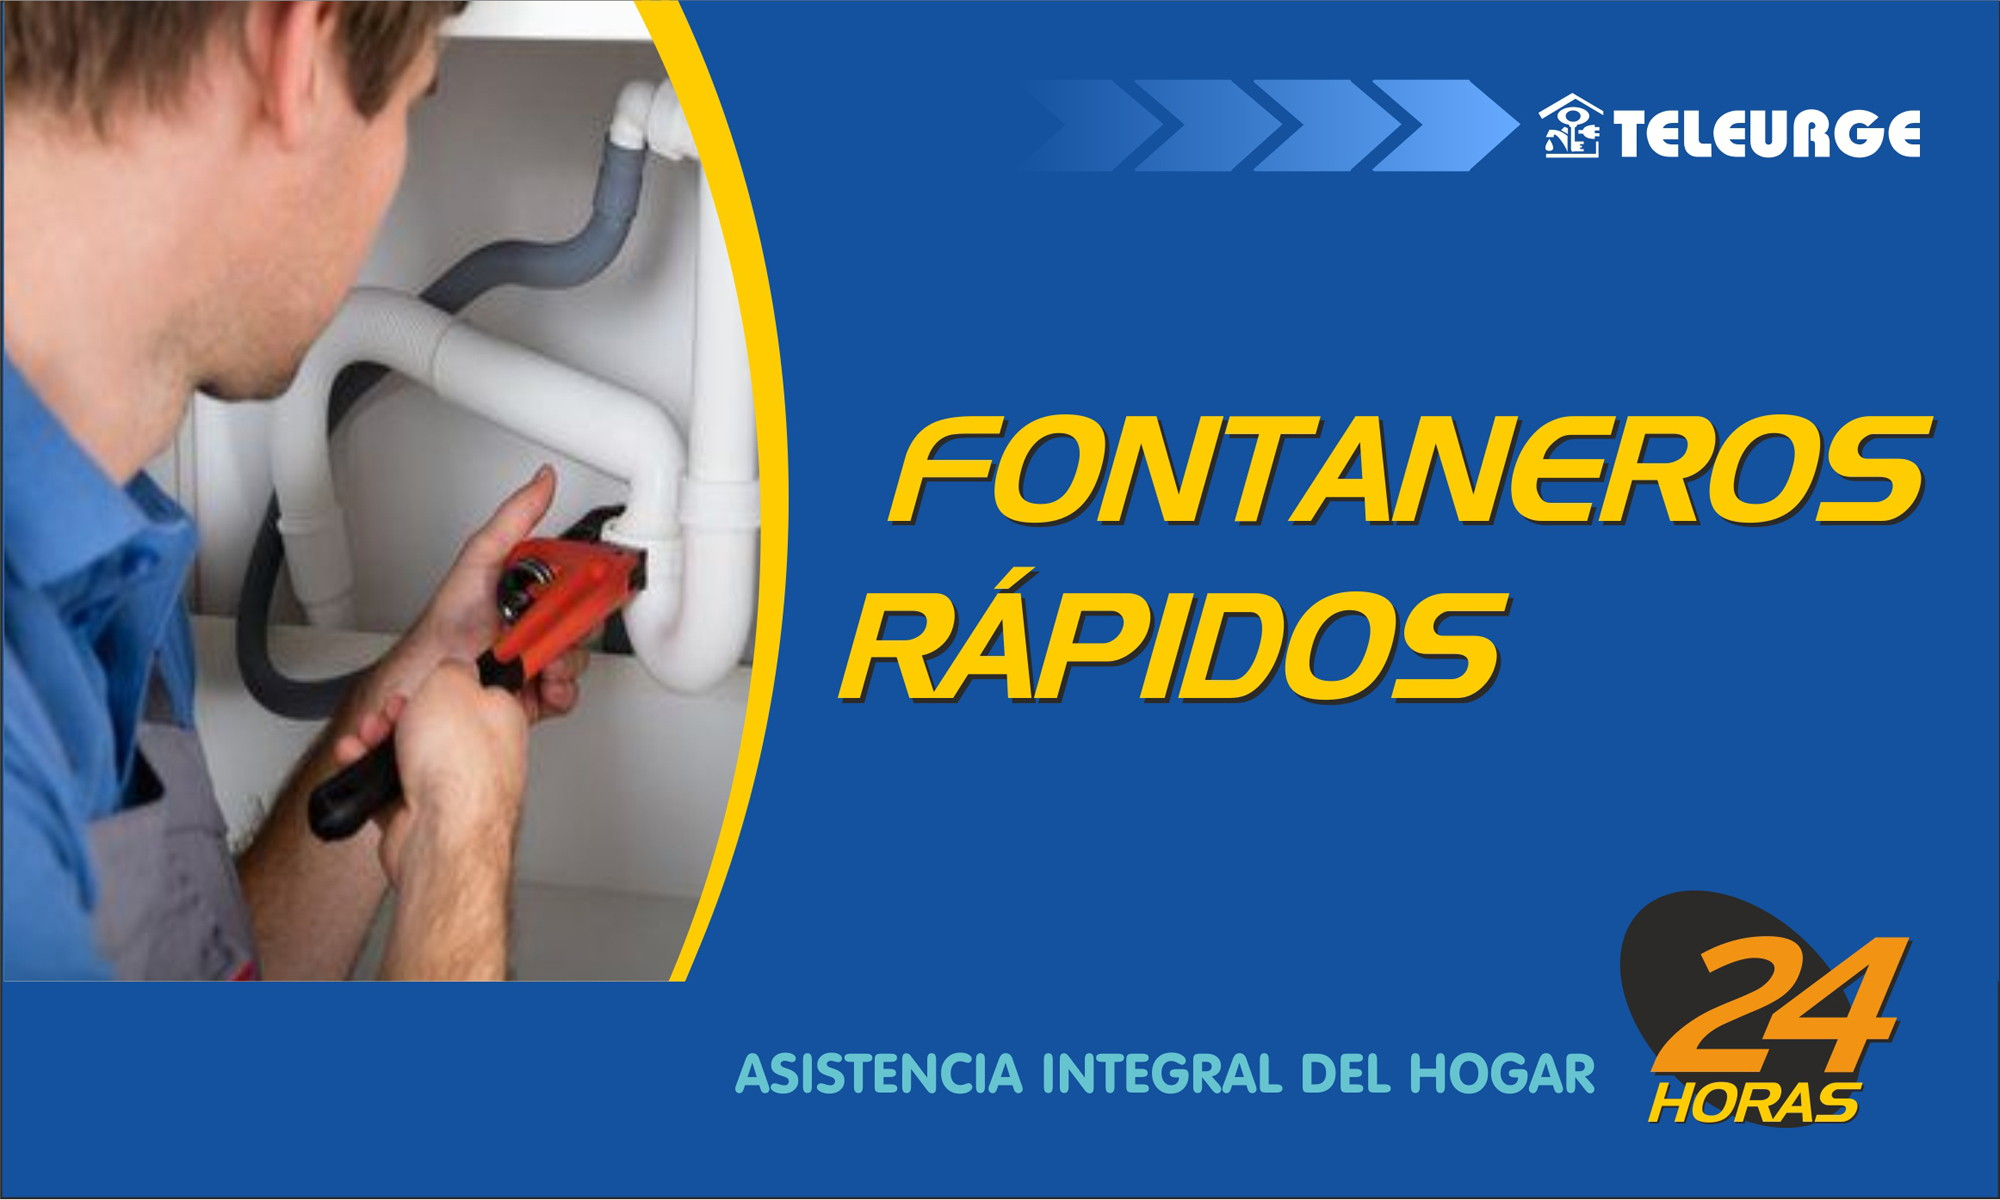 Fontaneros 628360733